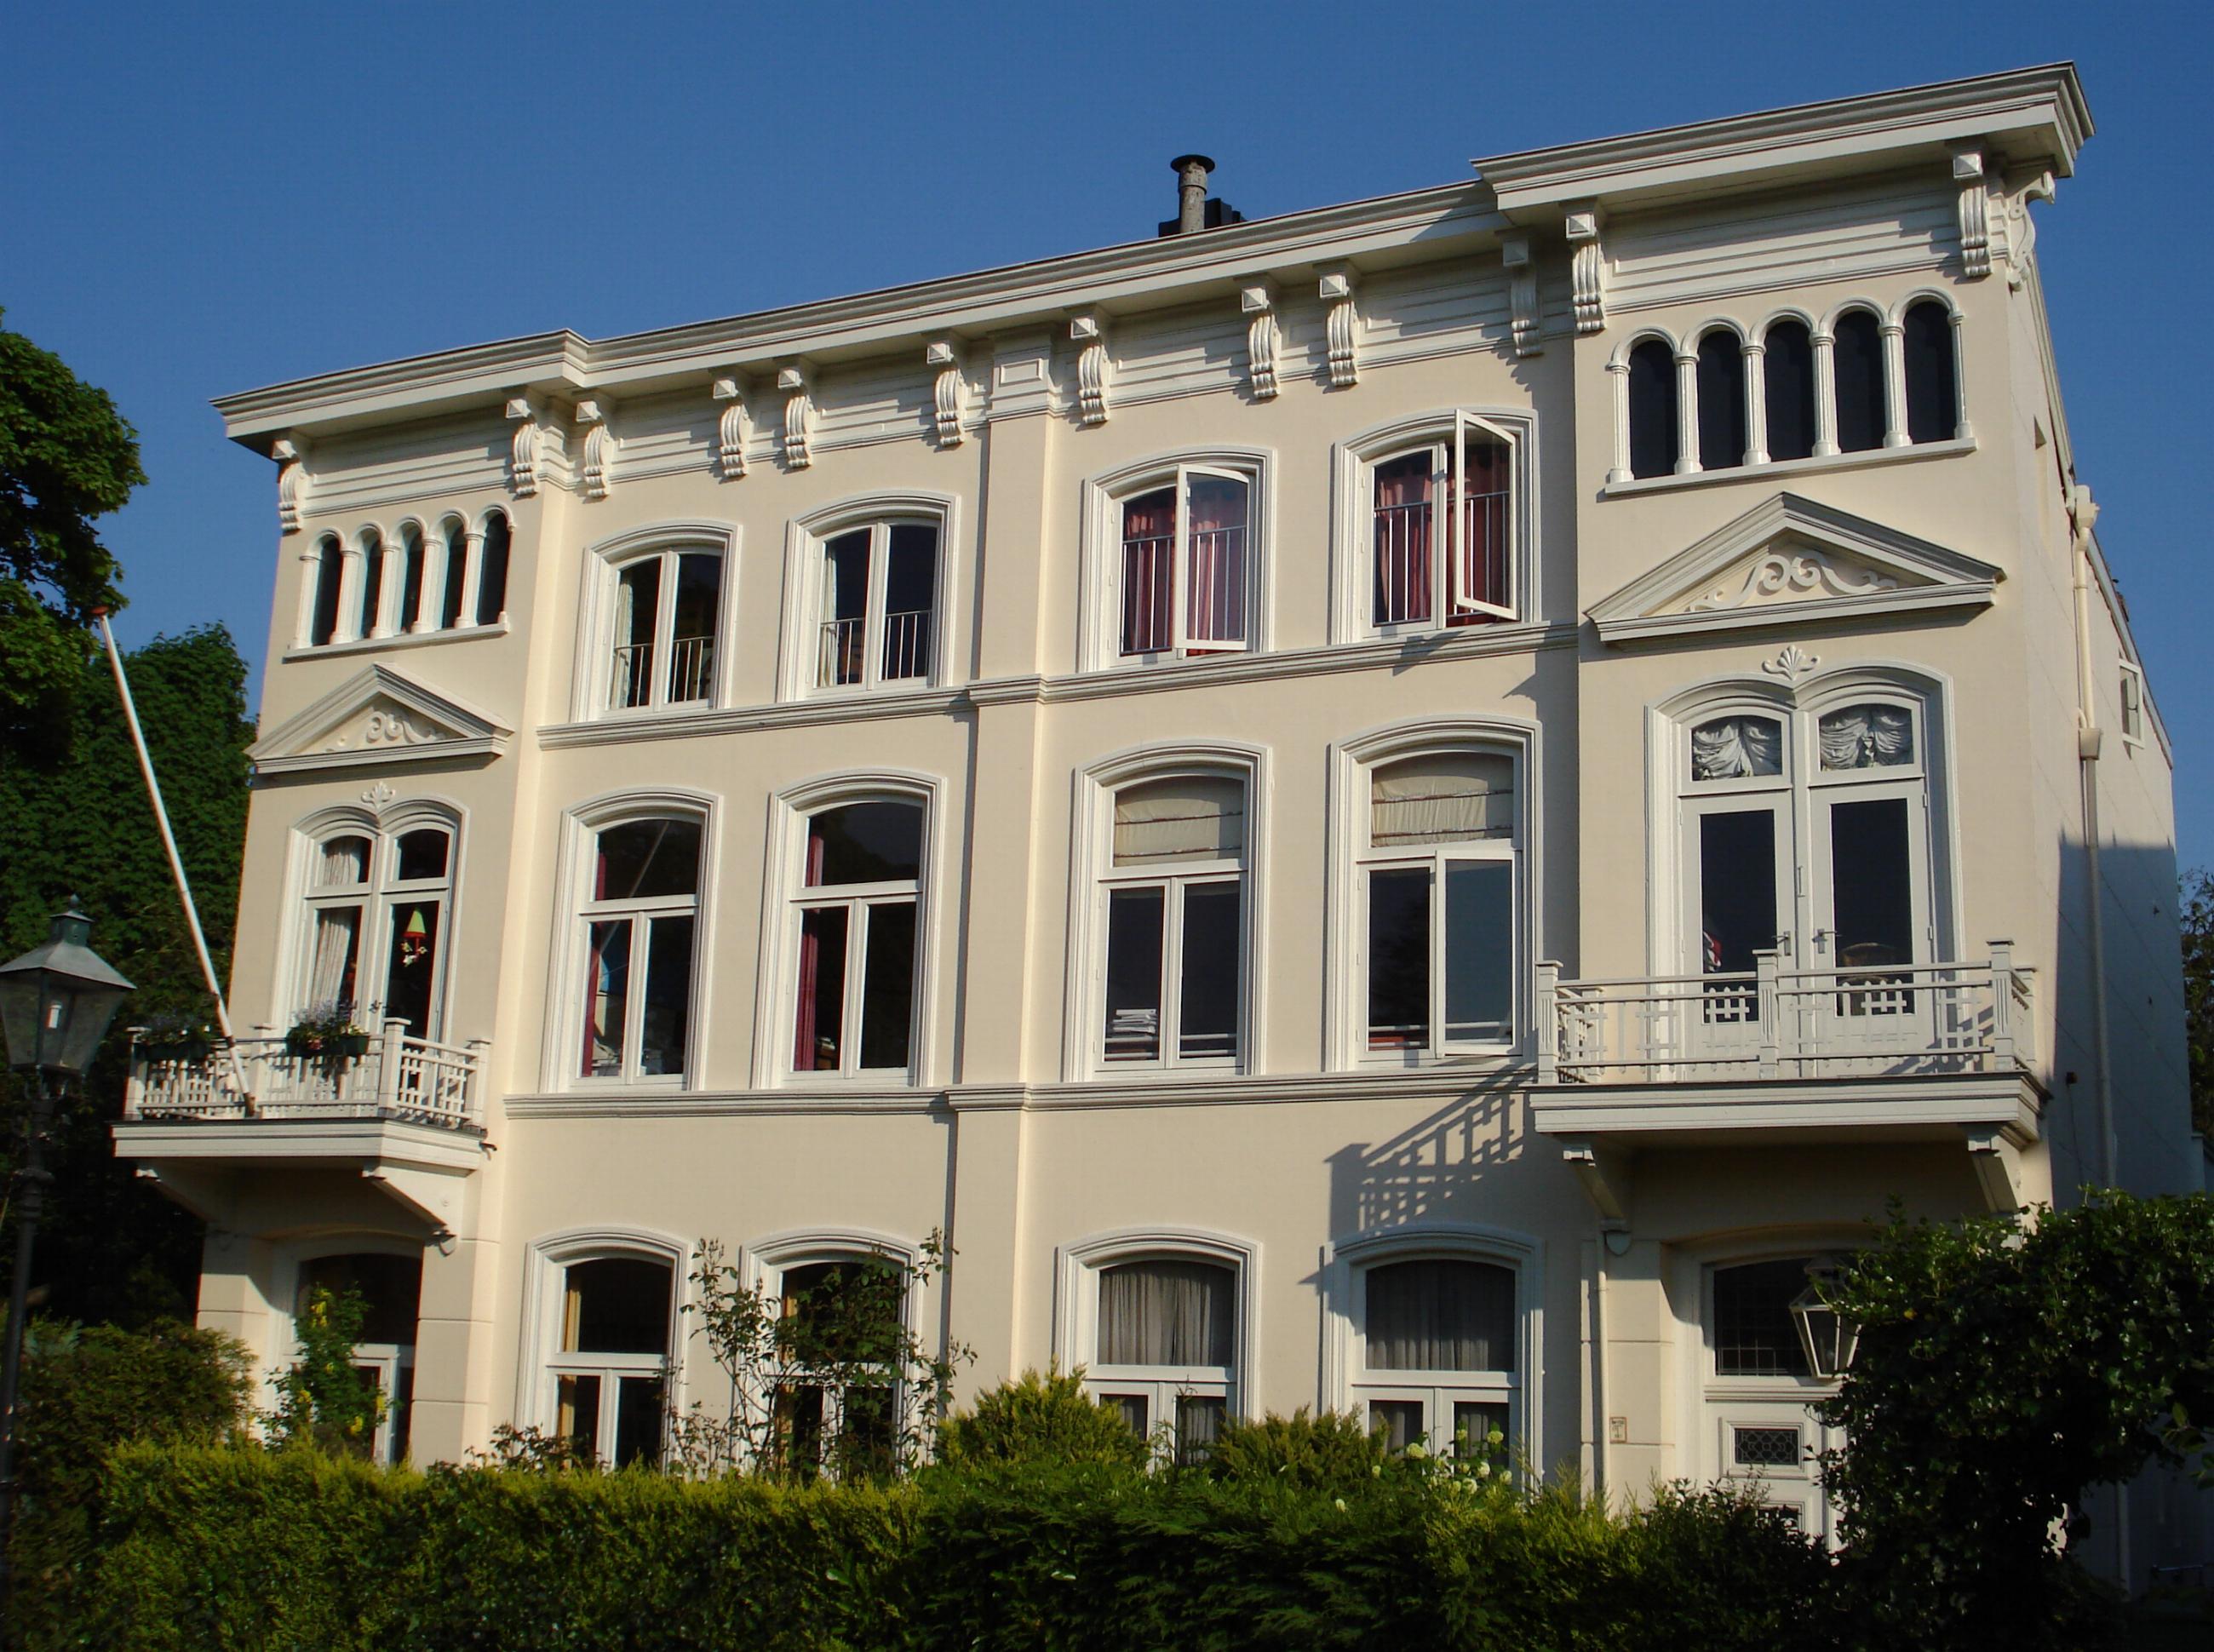 Geheel vrijstaand dubbel woonhuis in rotterdam monument for Woonhuis rotterdam